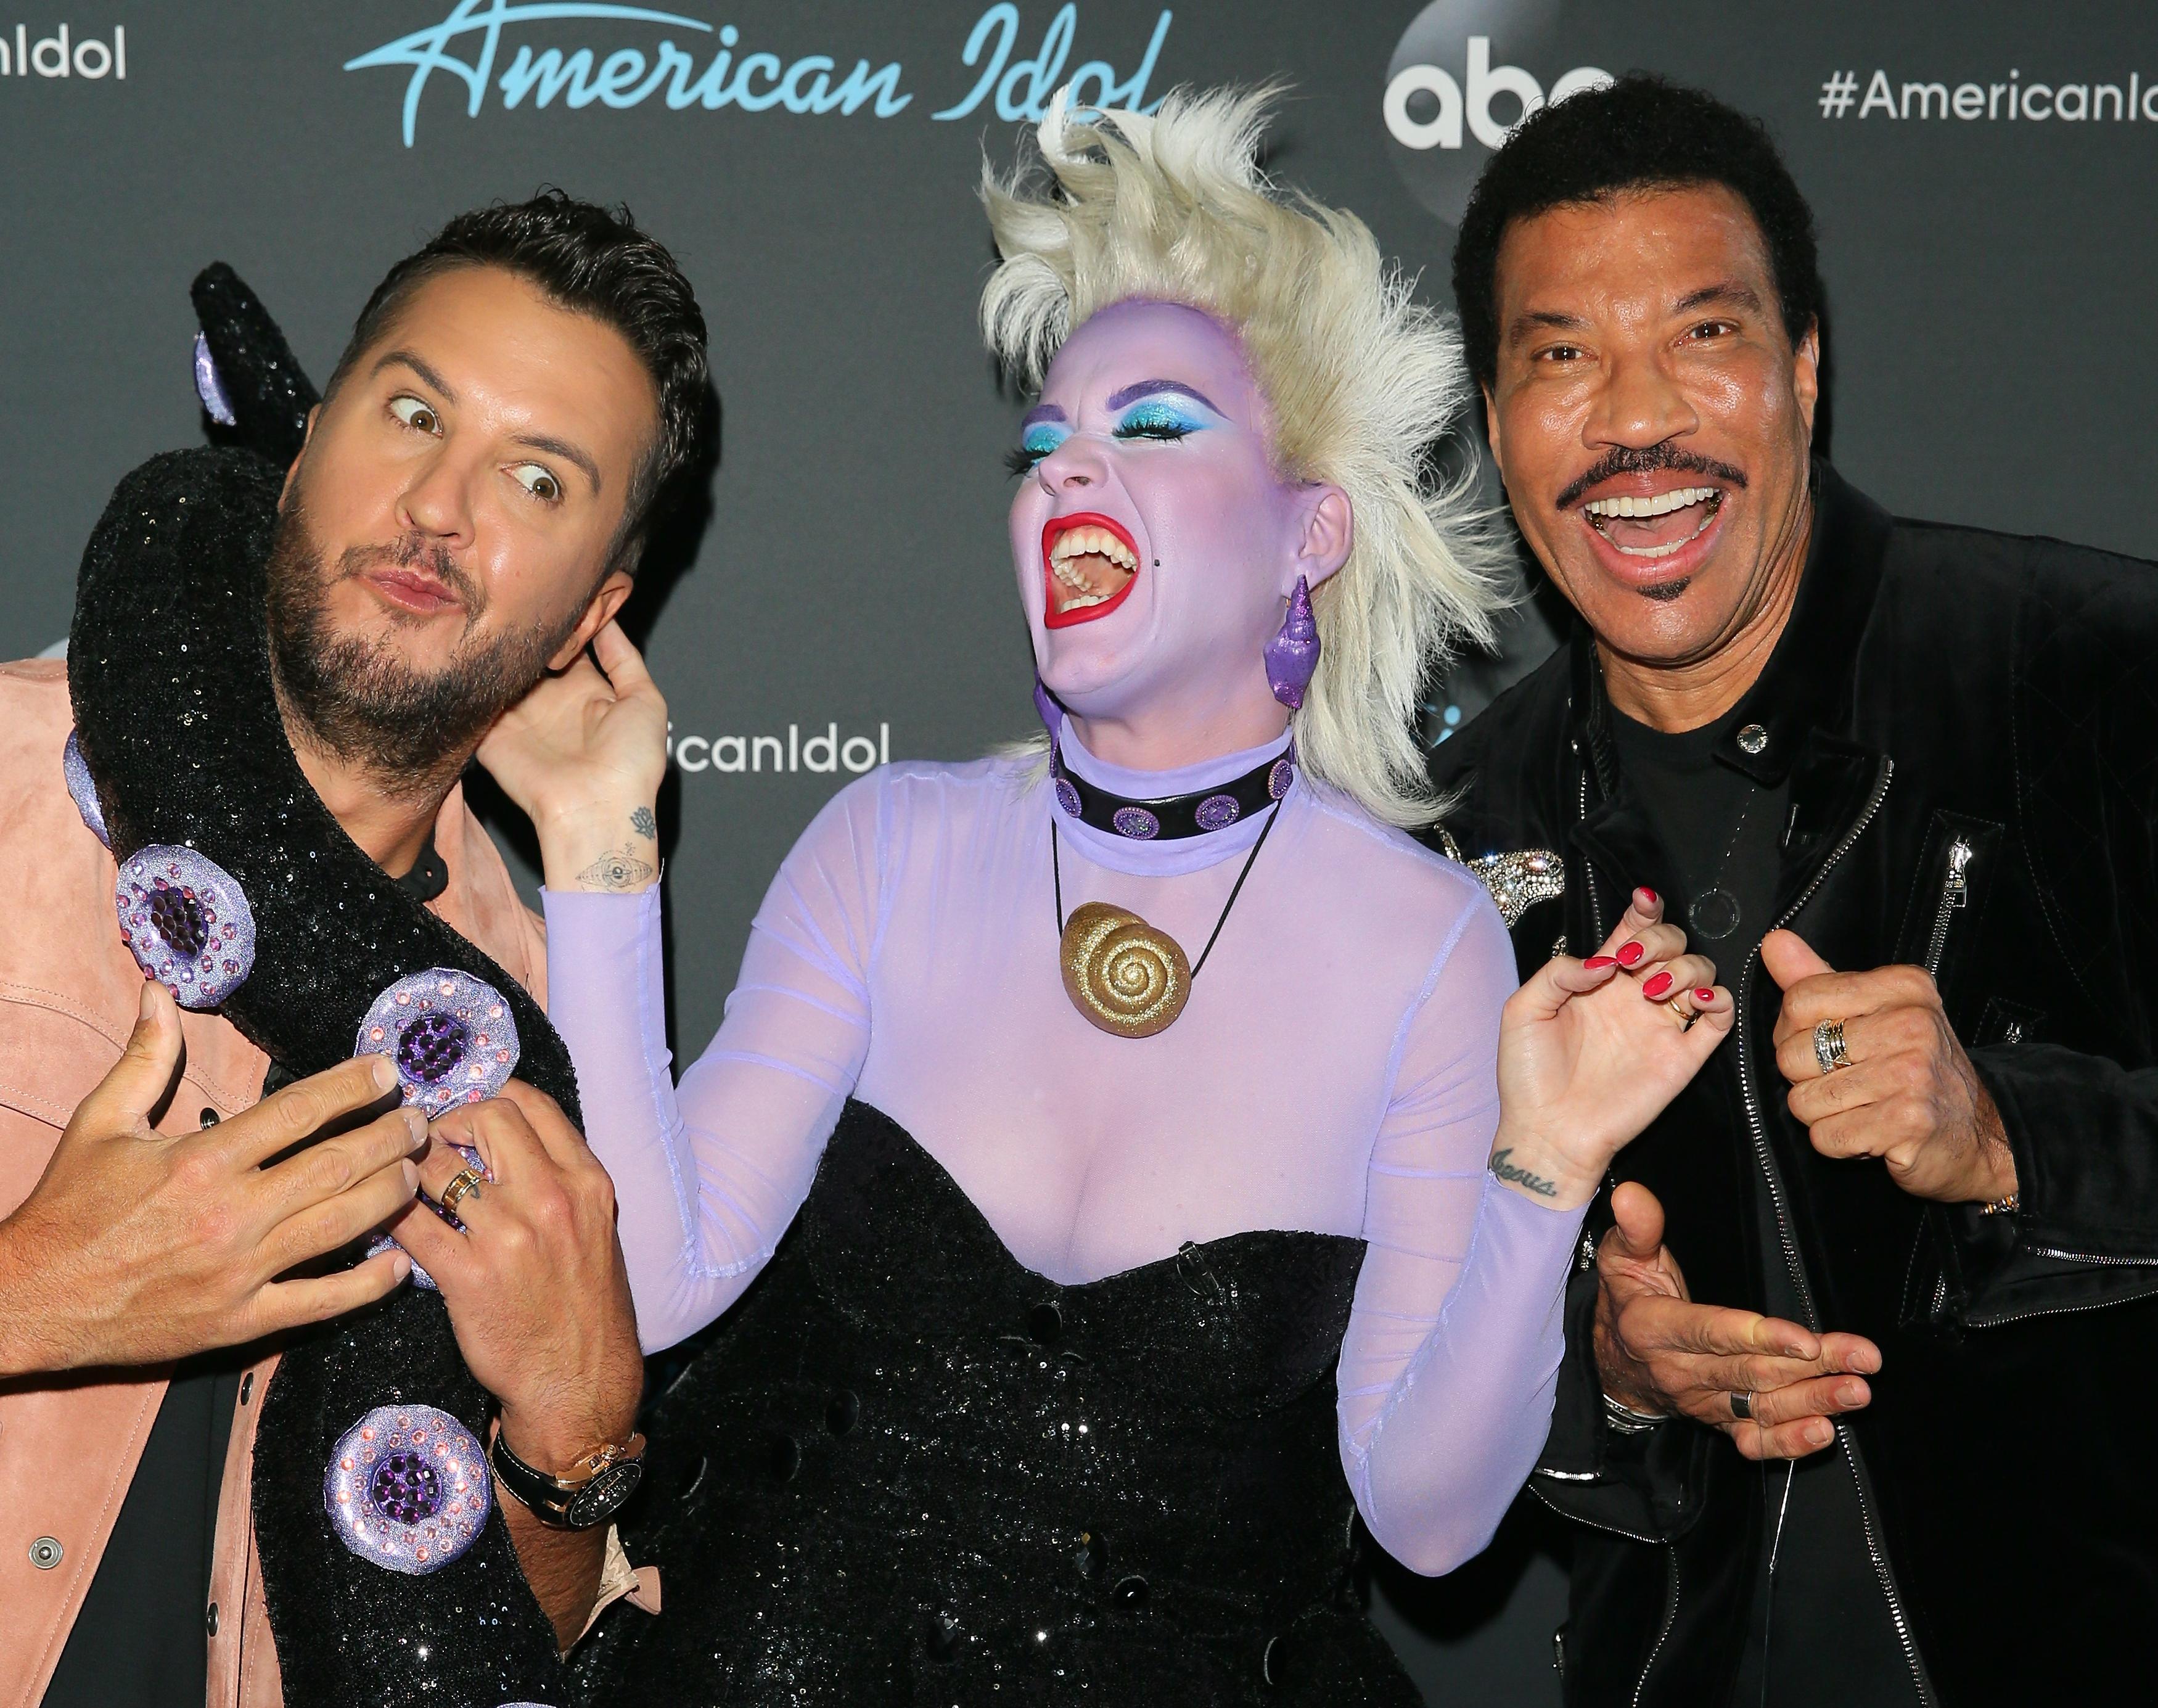 Katy Perry, Lionel Richie, Luke Bryan